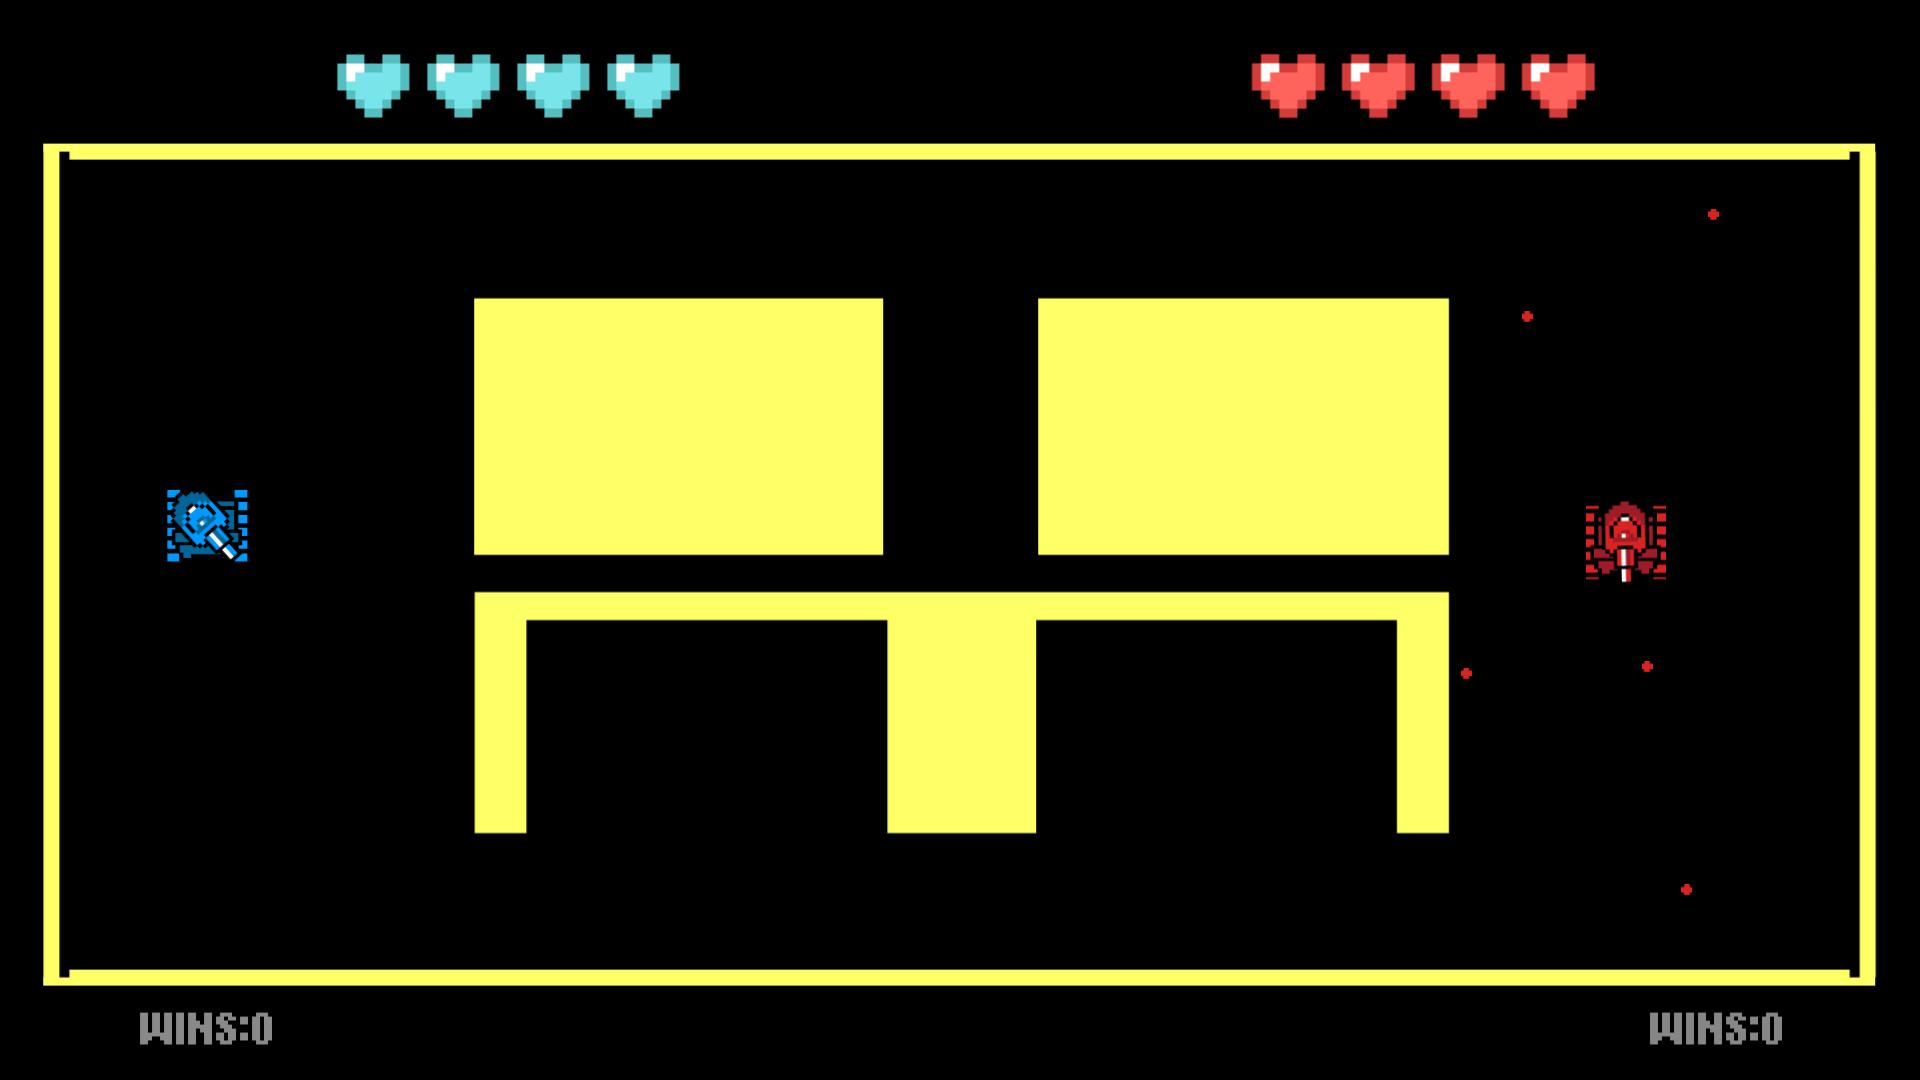 Tank Battle - 2 Player Classic Arcade Game screenshot 4